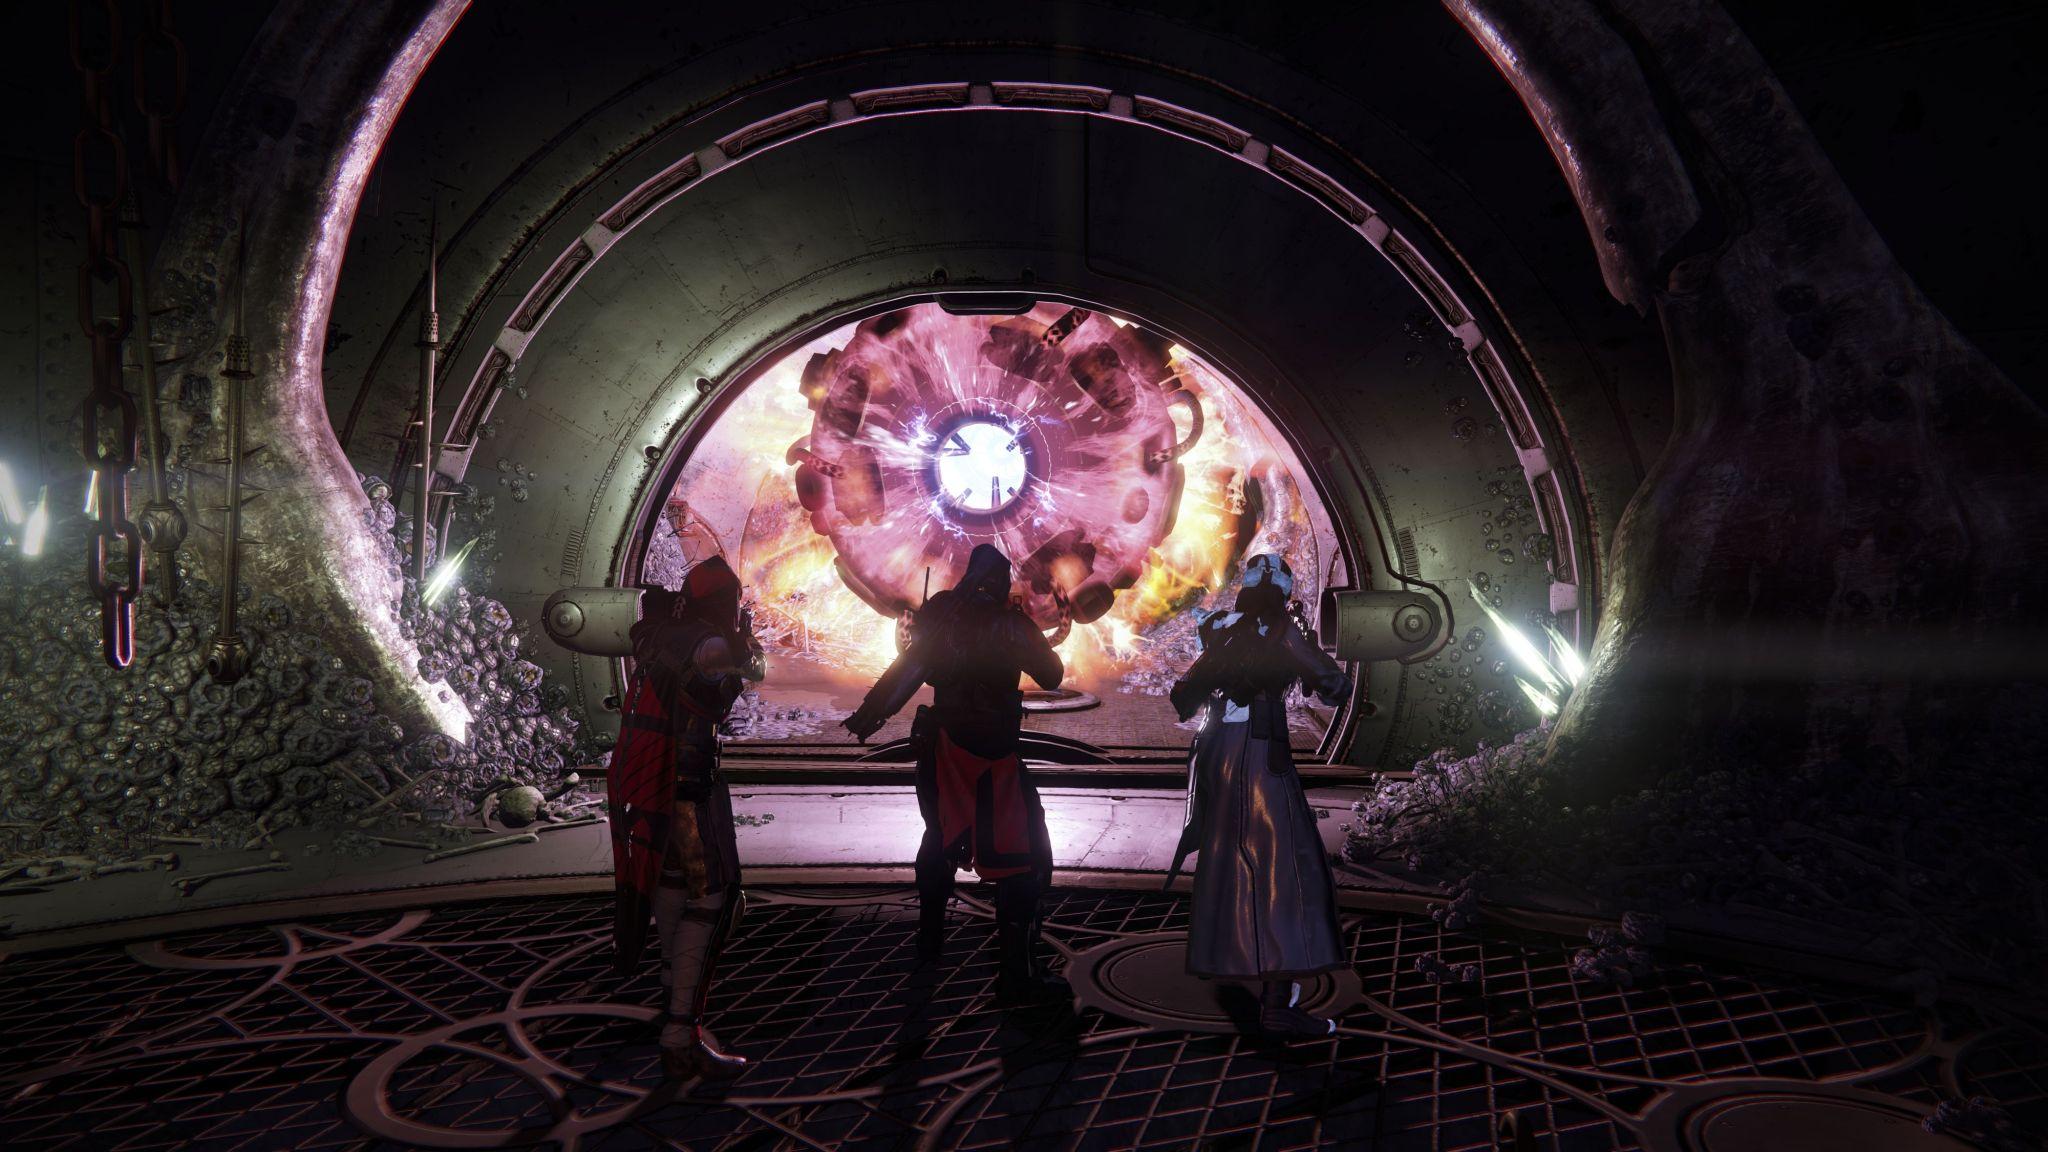 Destiny no matchmaking for heroic strike